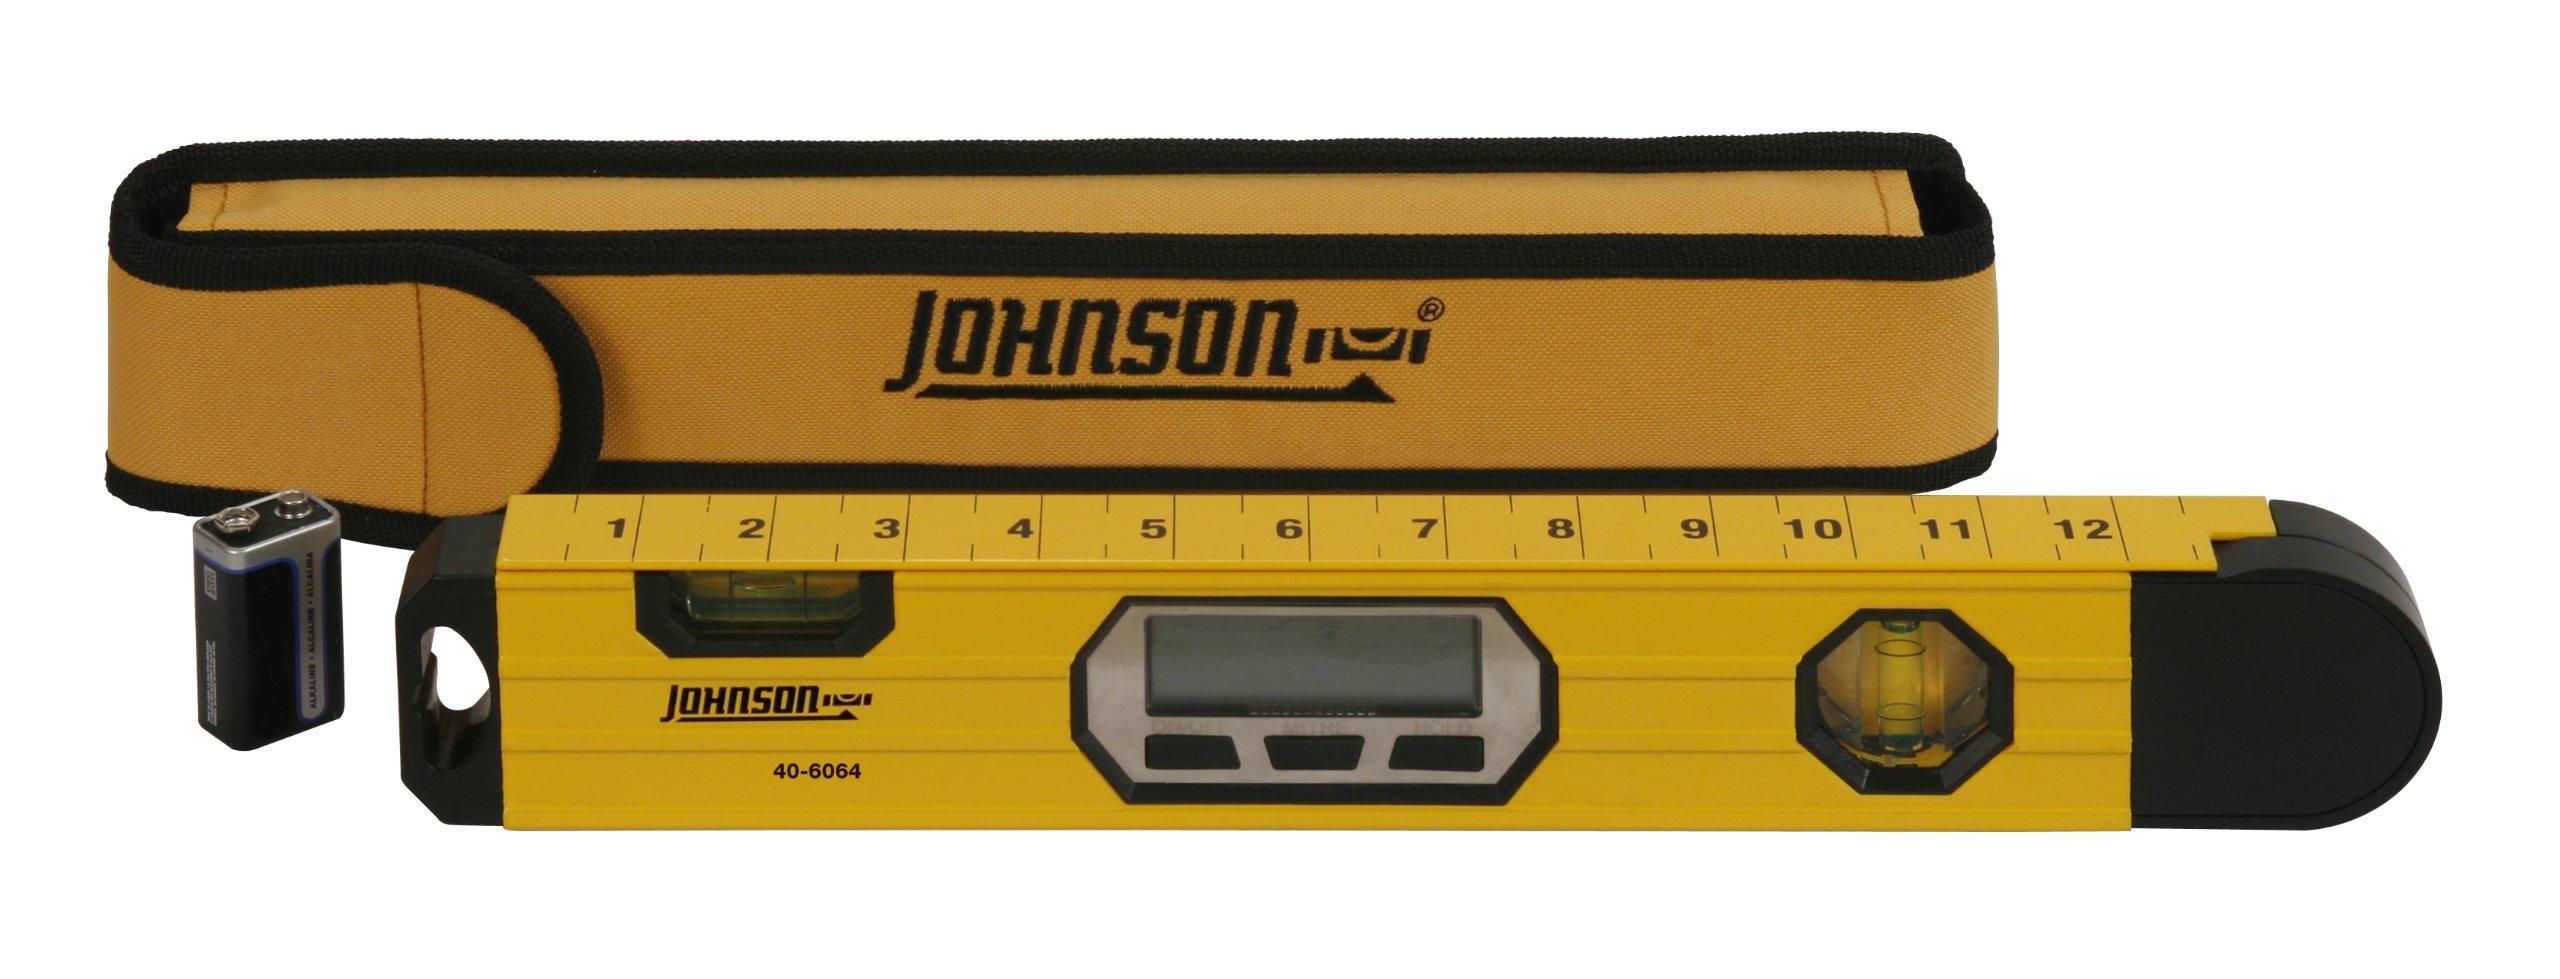 Johnson Level and Tool 40-6064 Digital Angle Locator